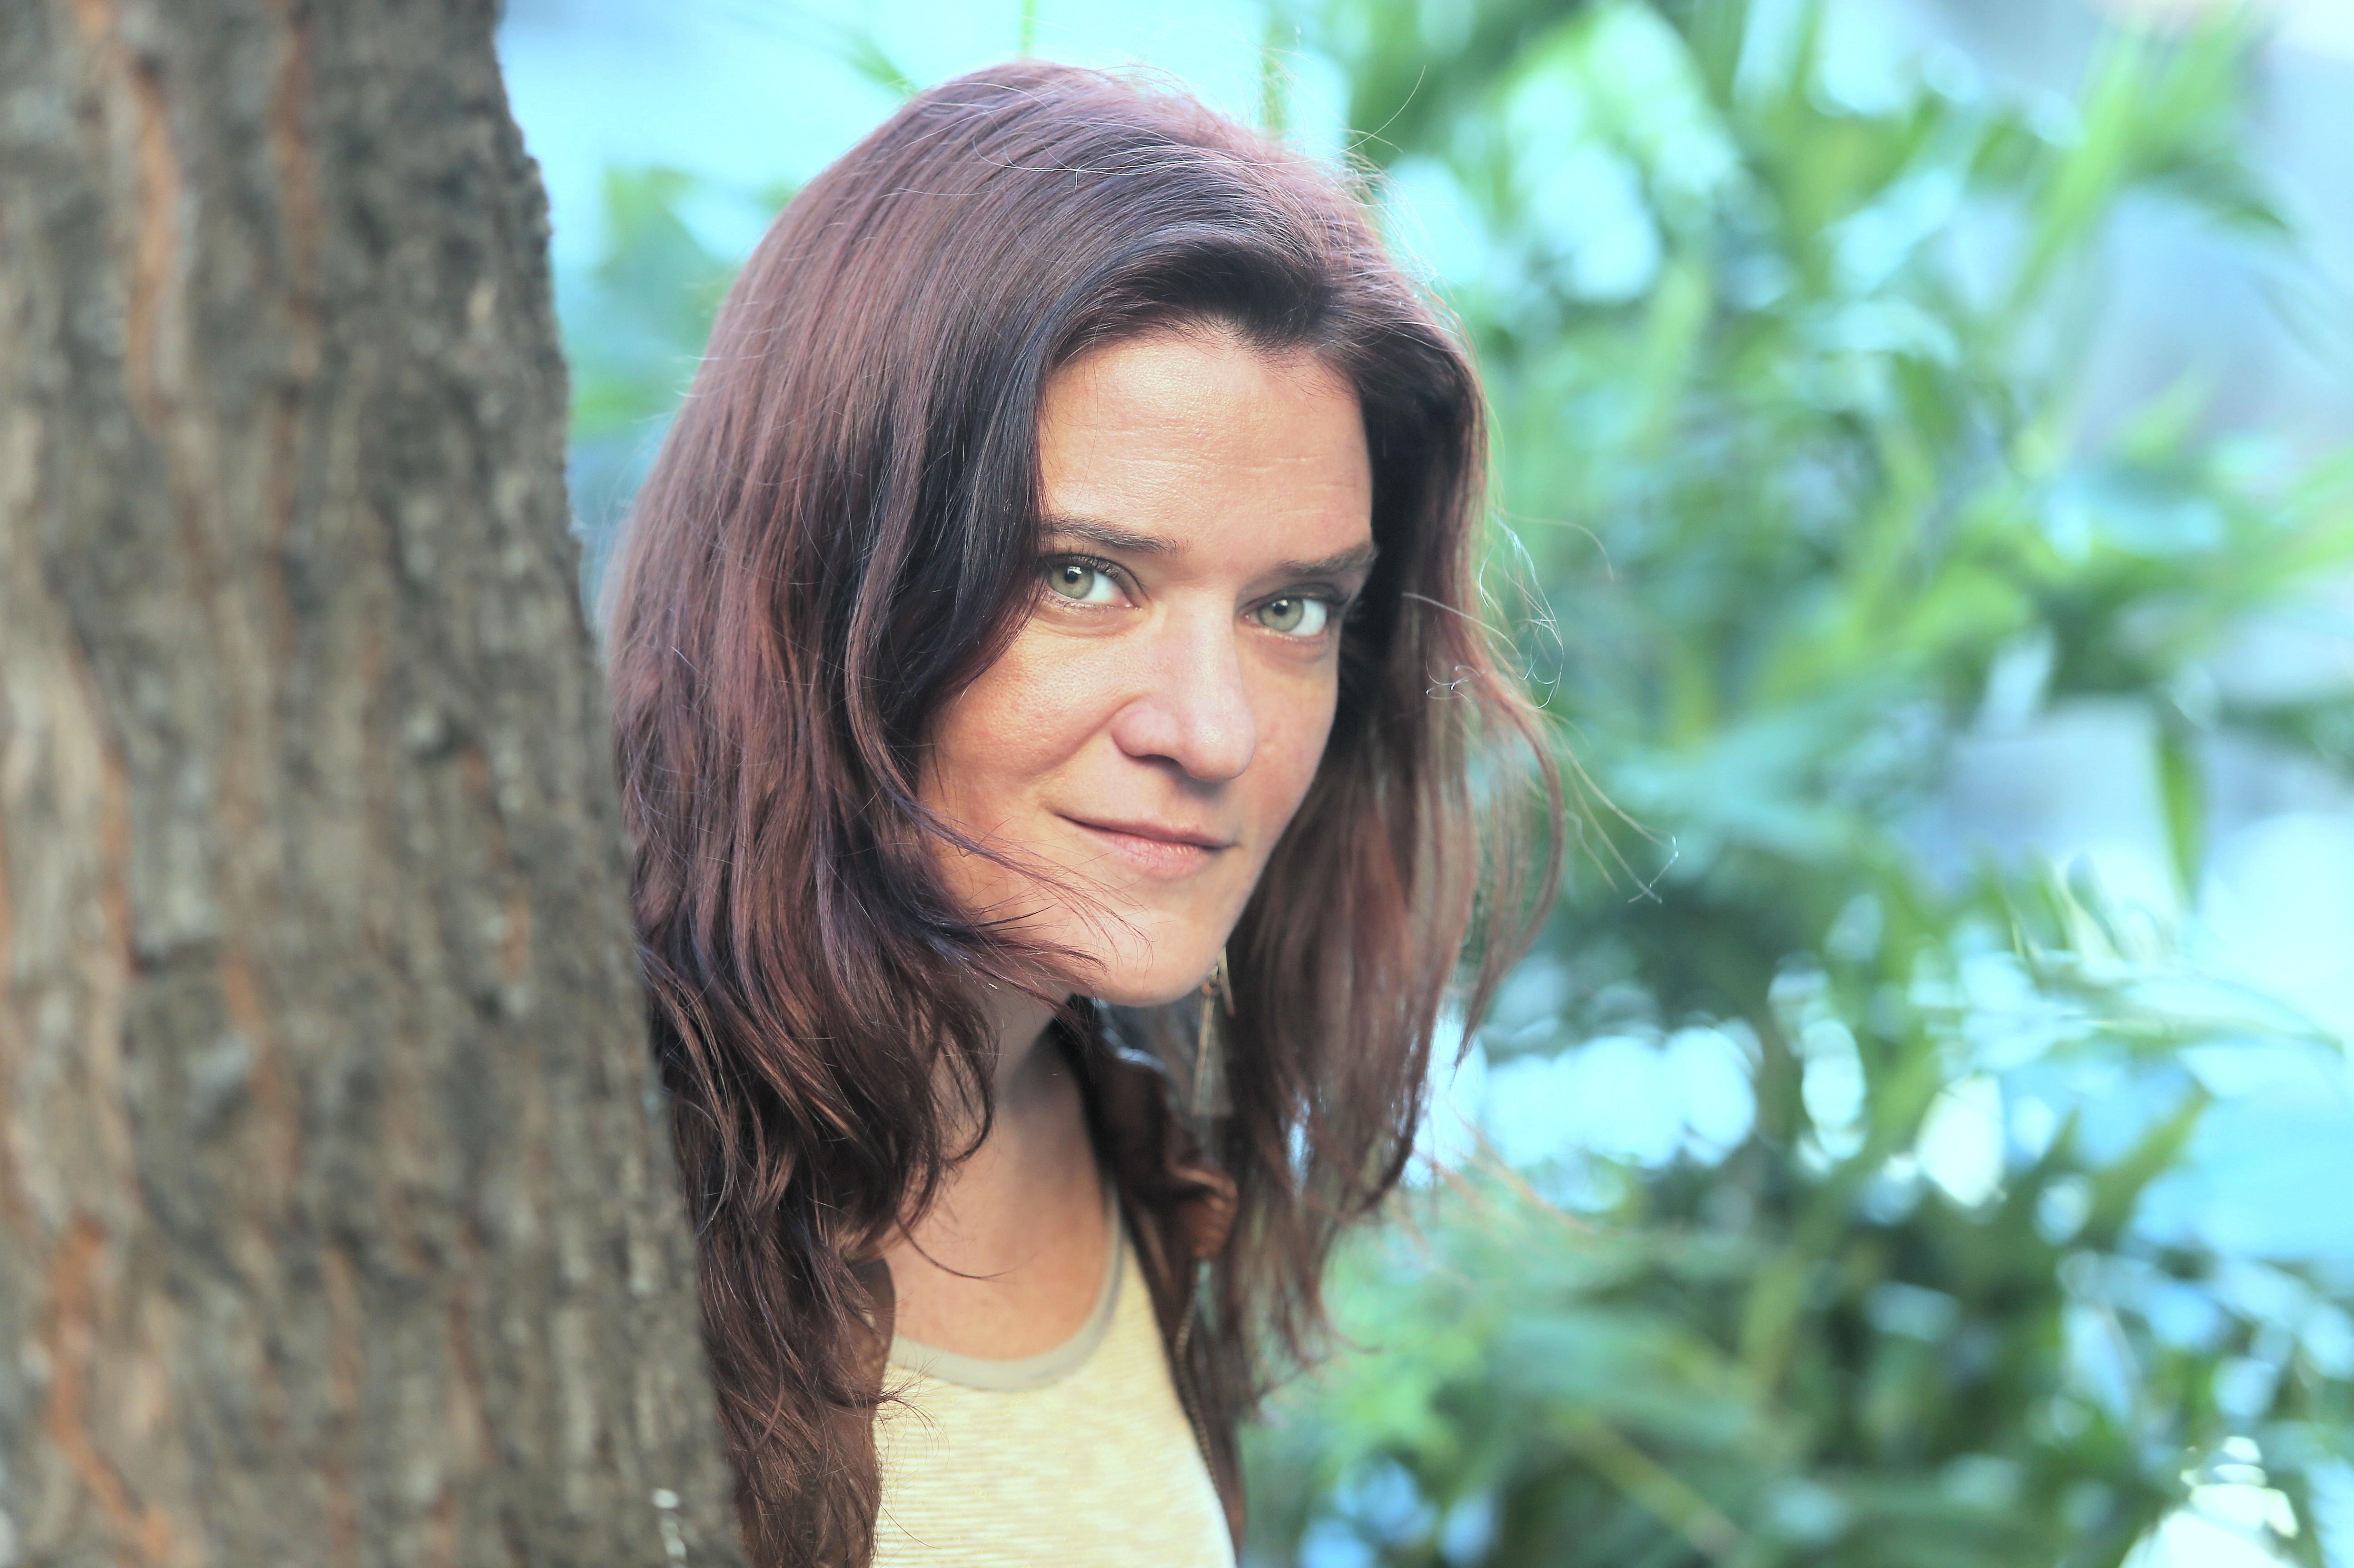 Florencia Abbate, escritora argentina a favor del aborto legal, seguro y gratuito.